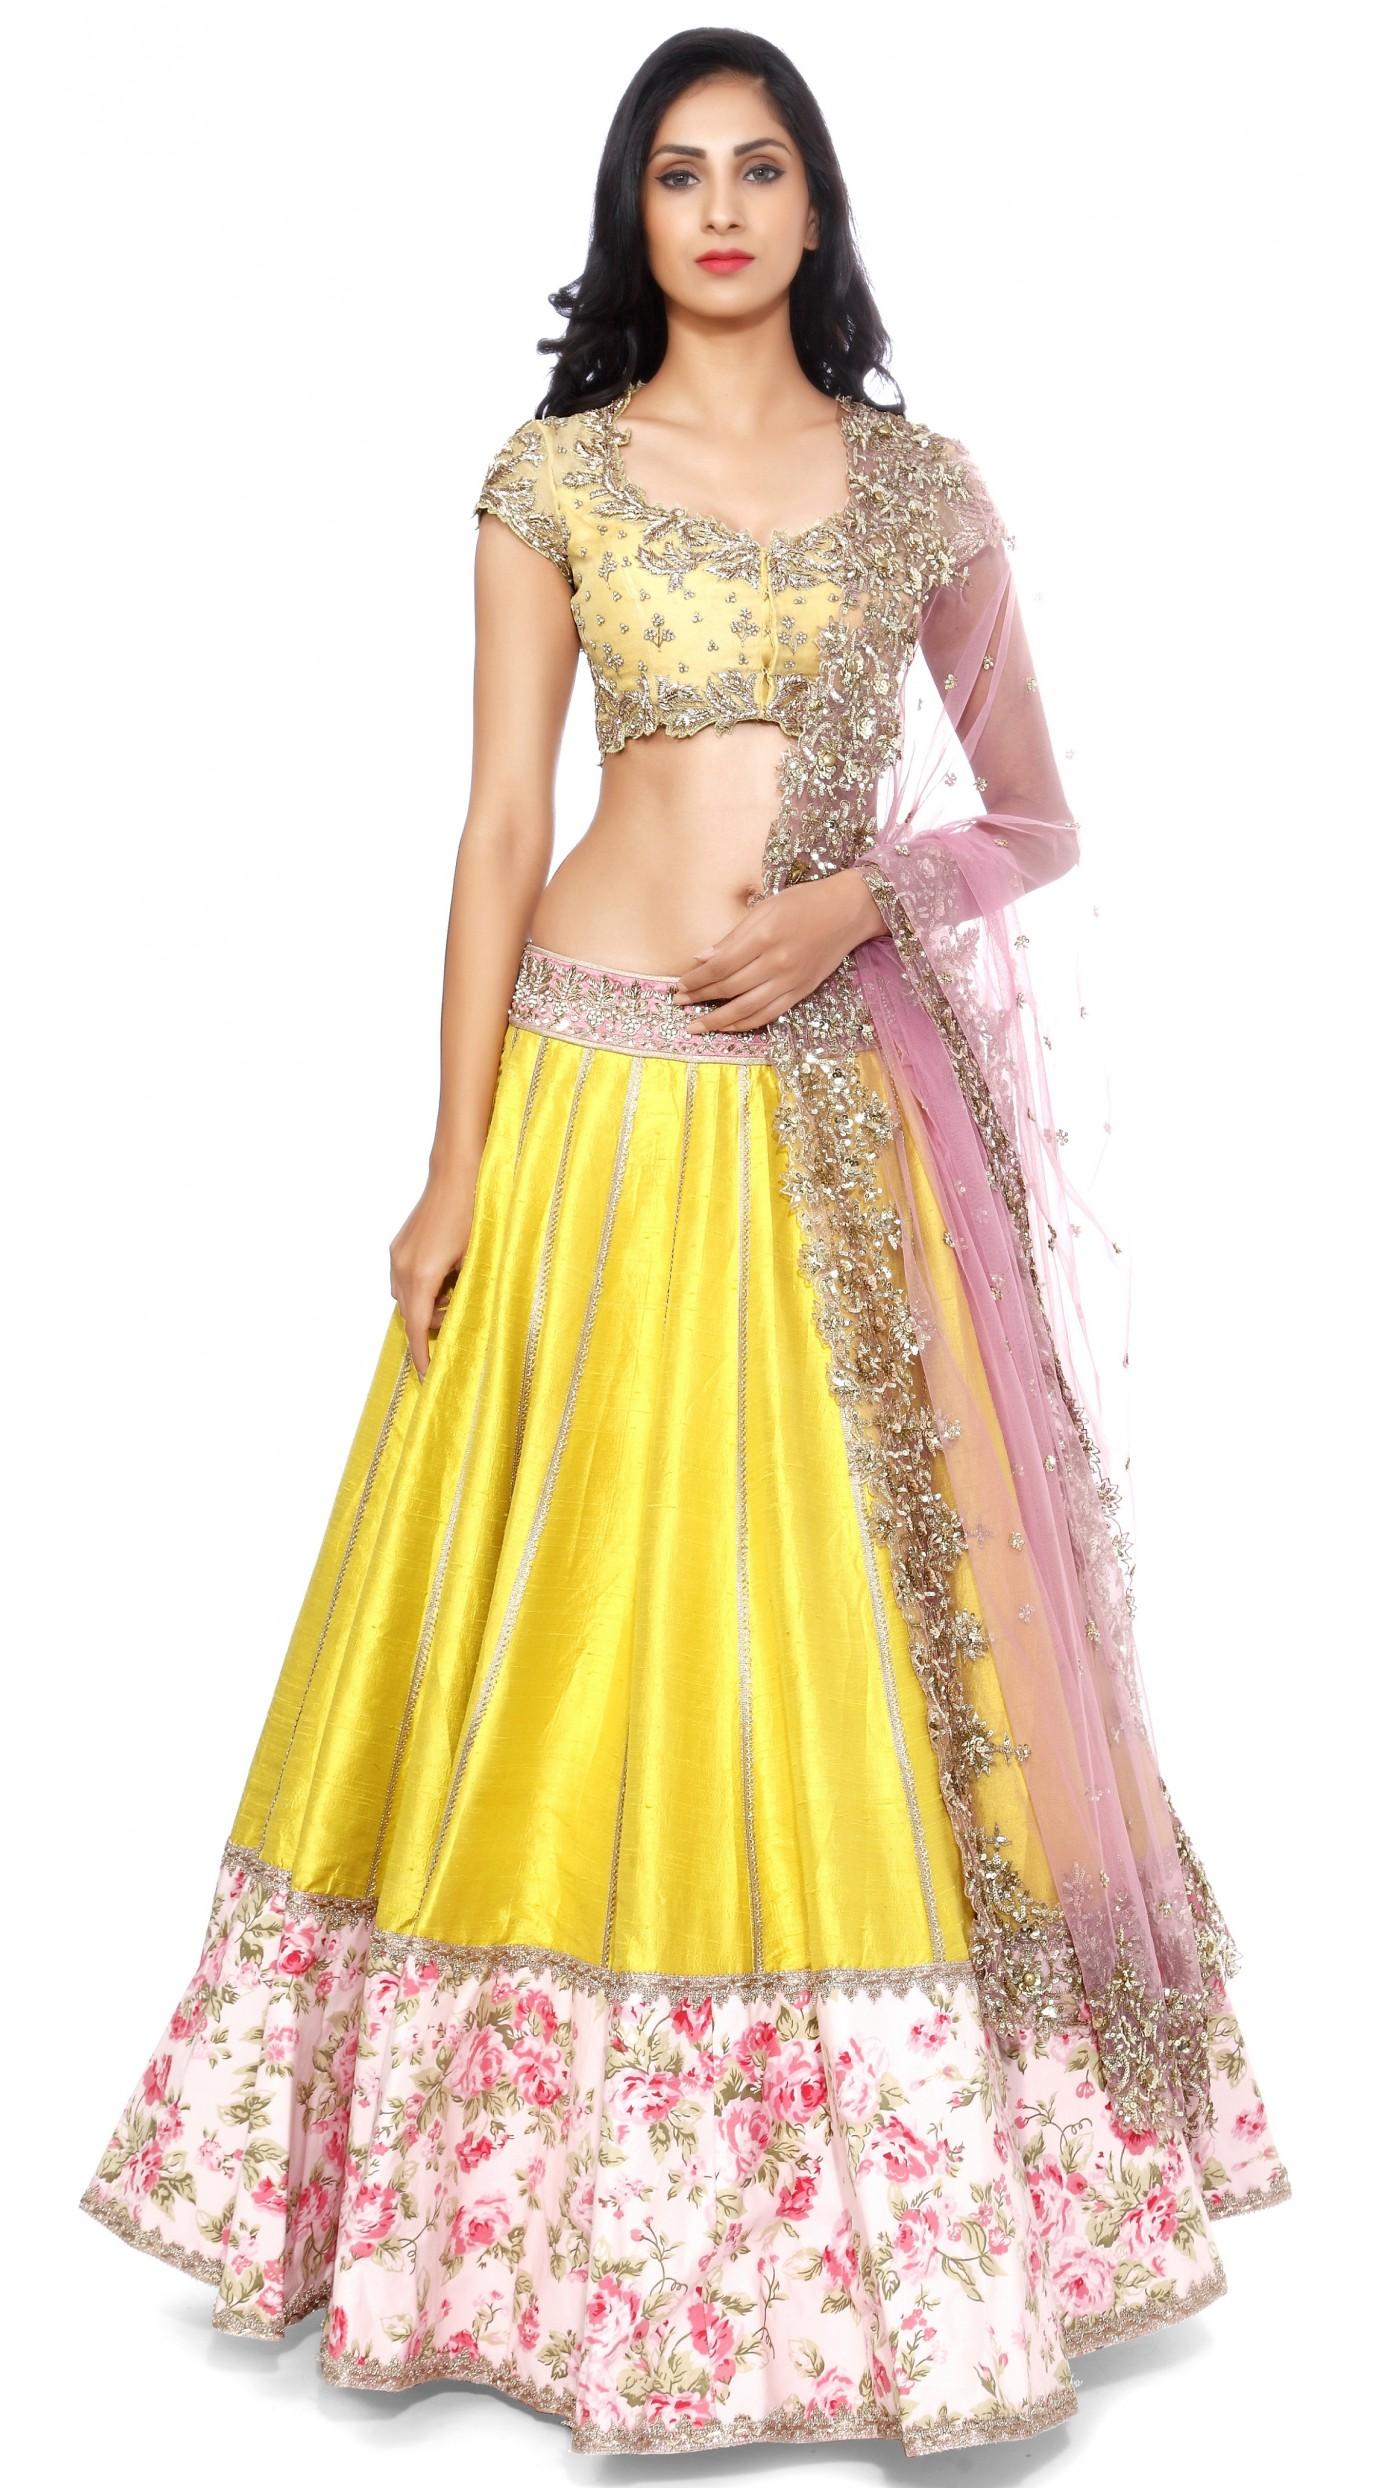 Rani Pink Colour Anushree Reddy S Yellow Raw Silk Lengha Set